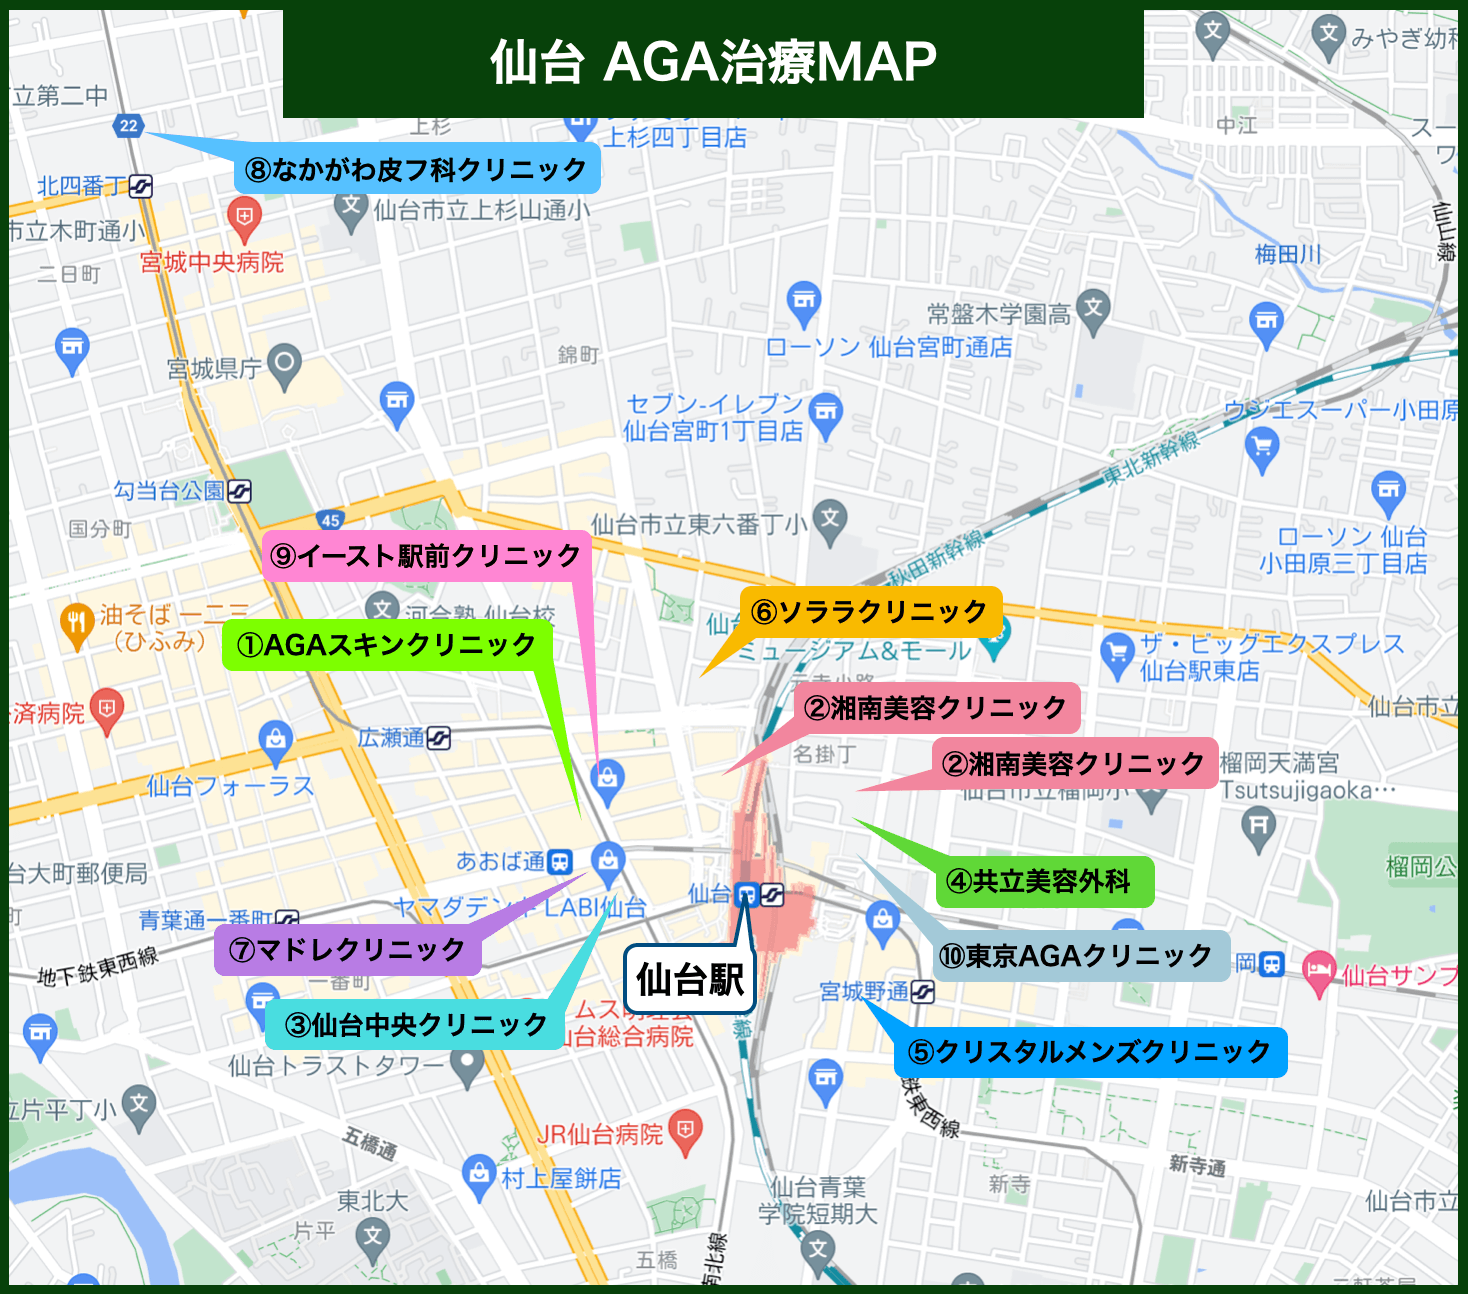 仙台AGA治療MAP